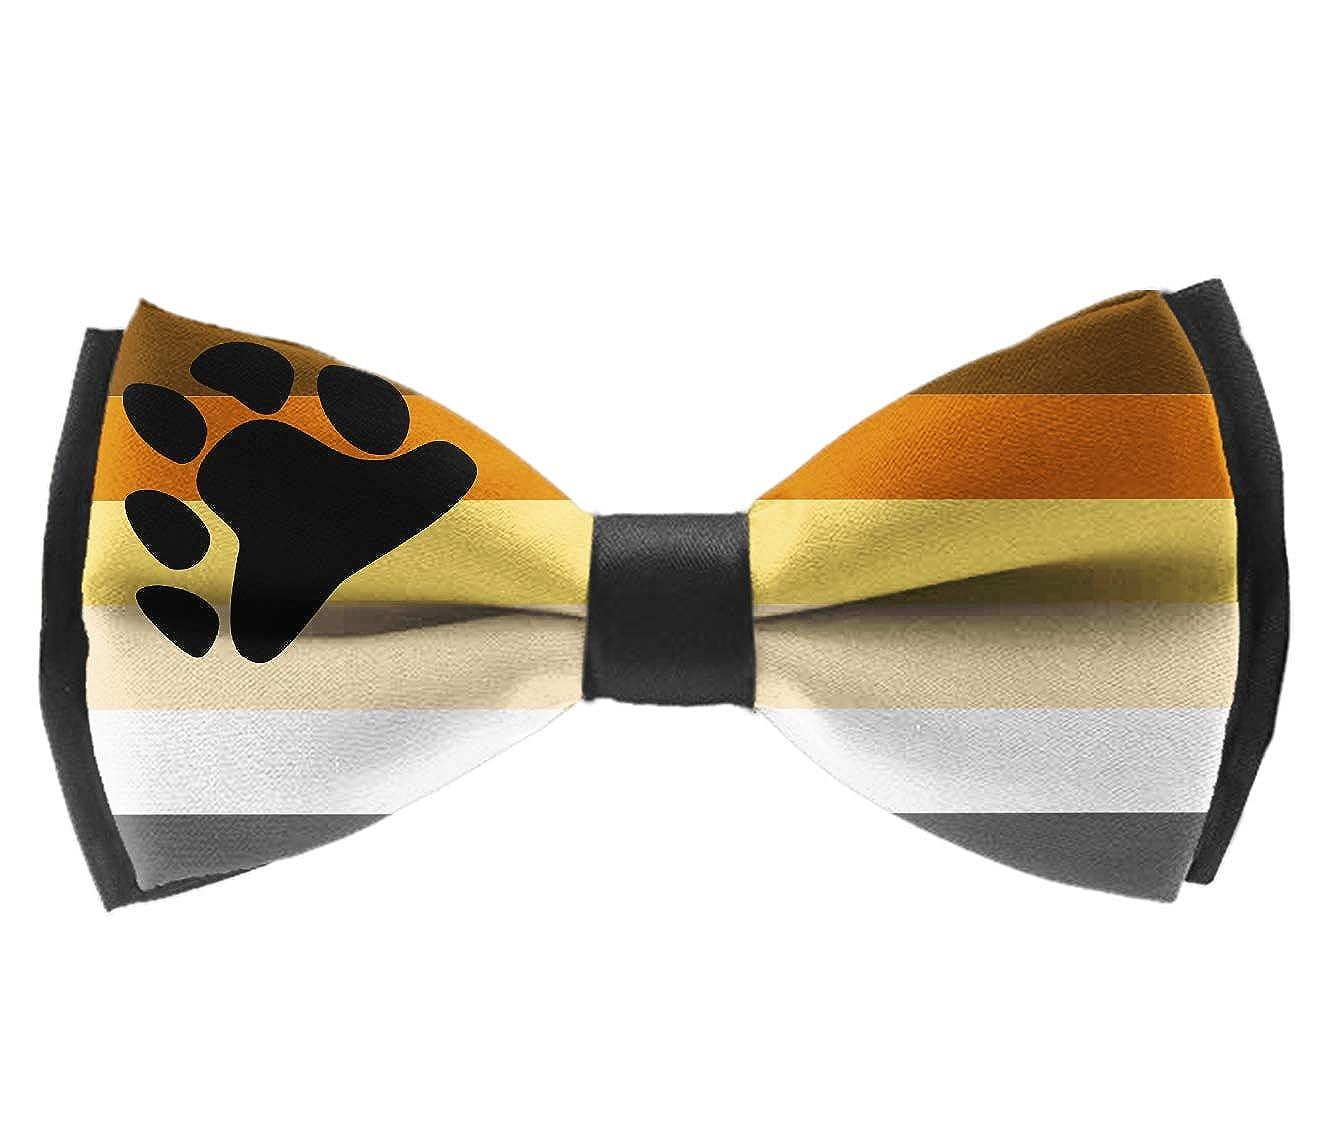 Classic Men Pre-tied Bow Tie Adjustable Bowtie Gift Leopard Prints Printed